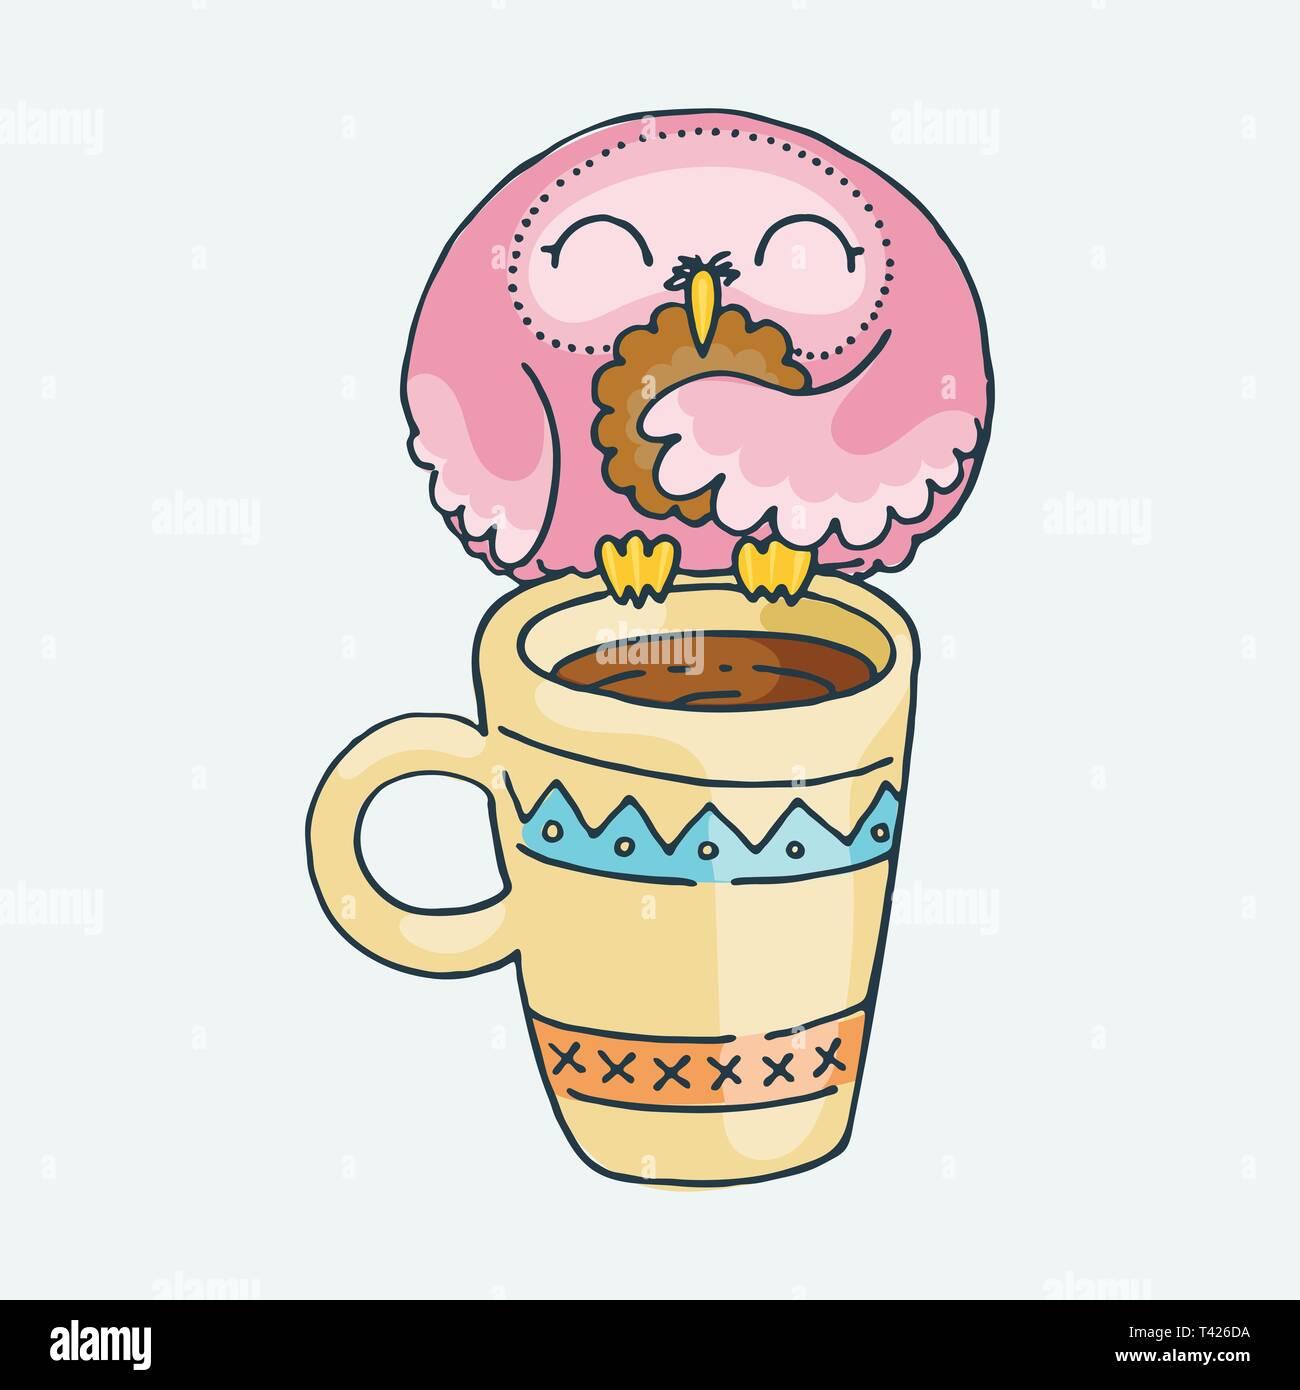 Cute Cartoon Owl On A Mug Vector Clip Art Illustration For Children Design Cards Prints Coloring Books Grungy Kawaii Image Stock Vector Image Art Alamy